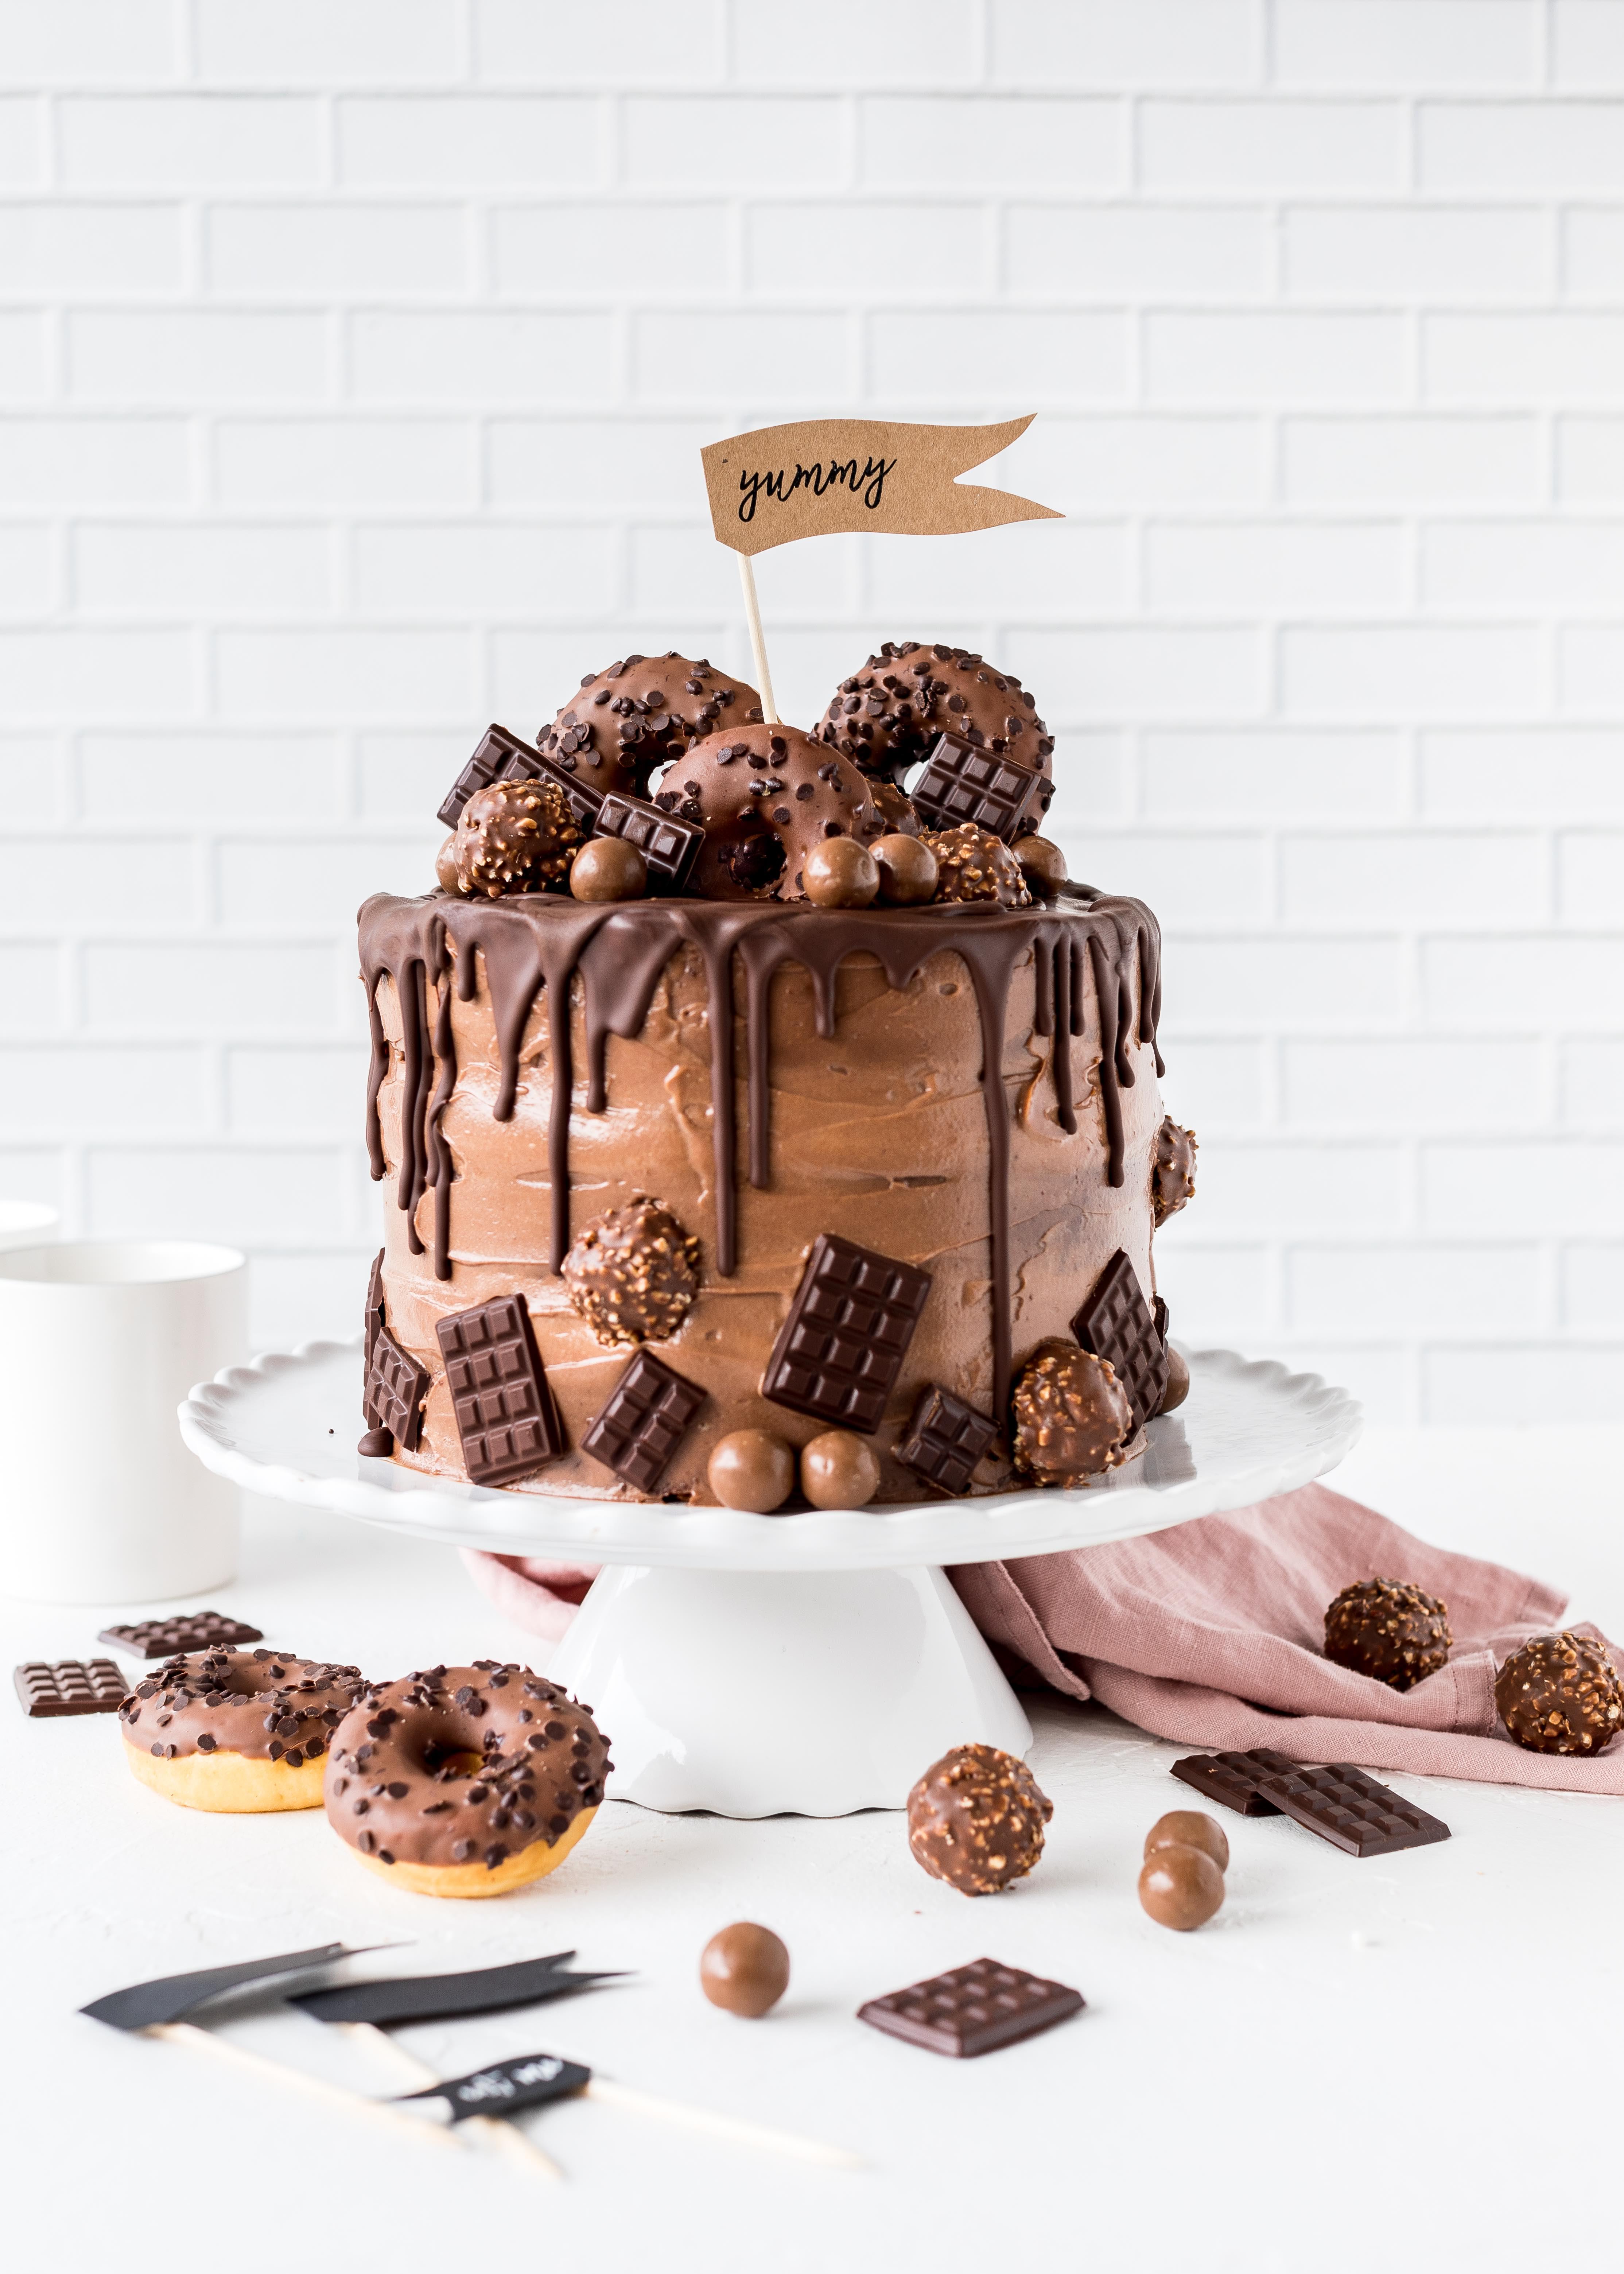 Nutella schoko torte emma 39 s lieblingsst cke - Cake pops 50 geburtstag ...